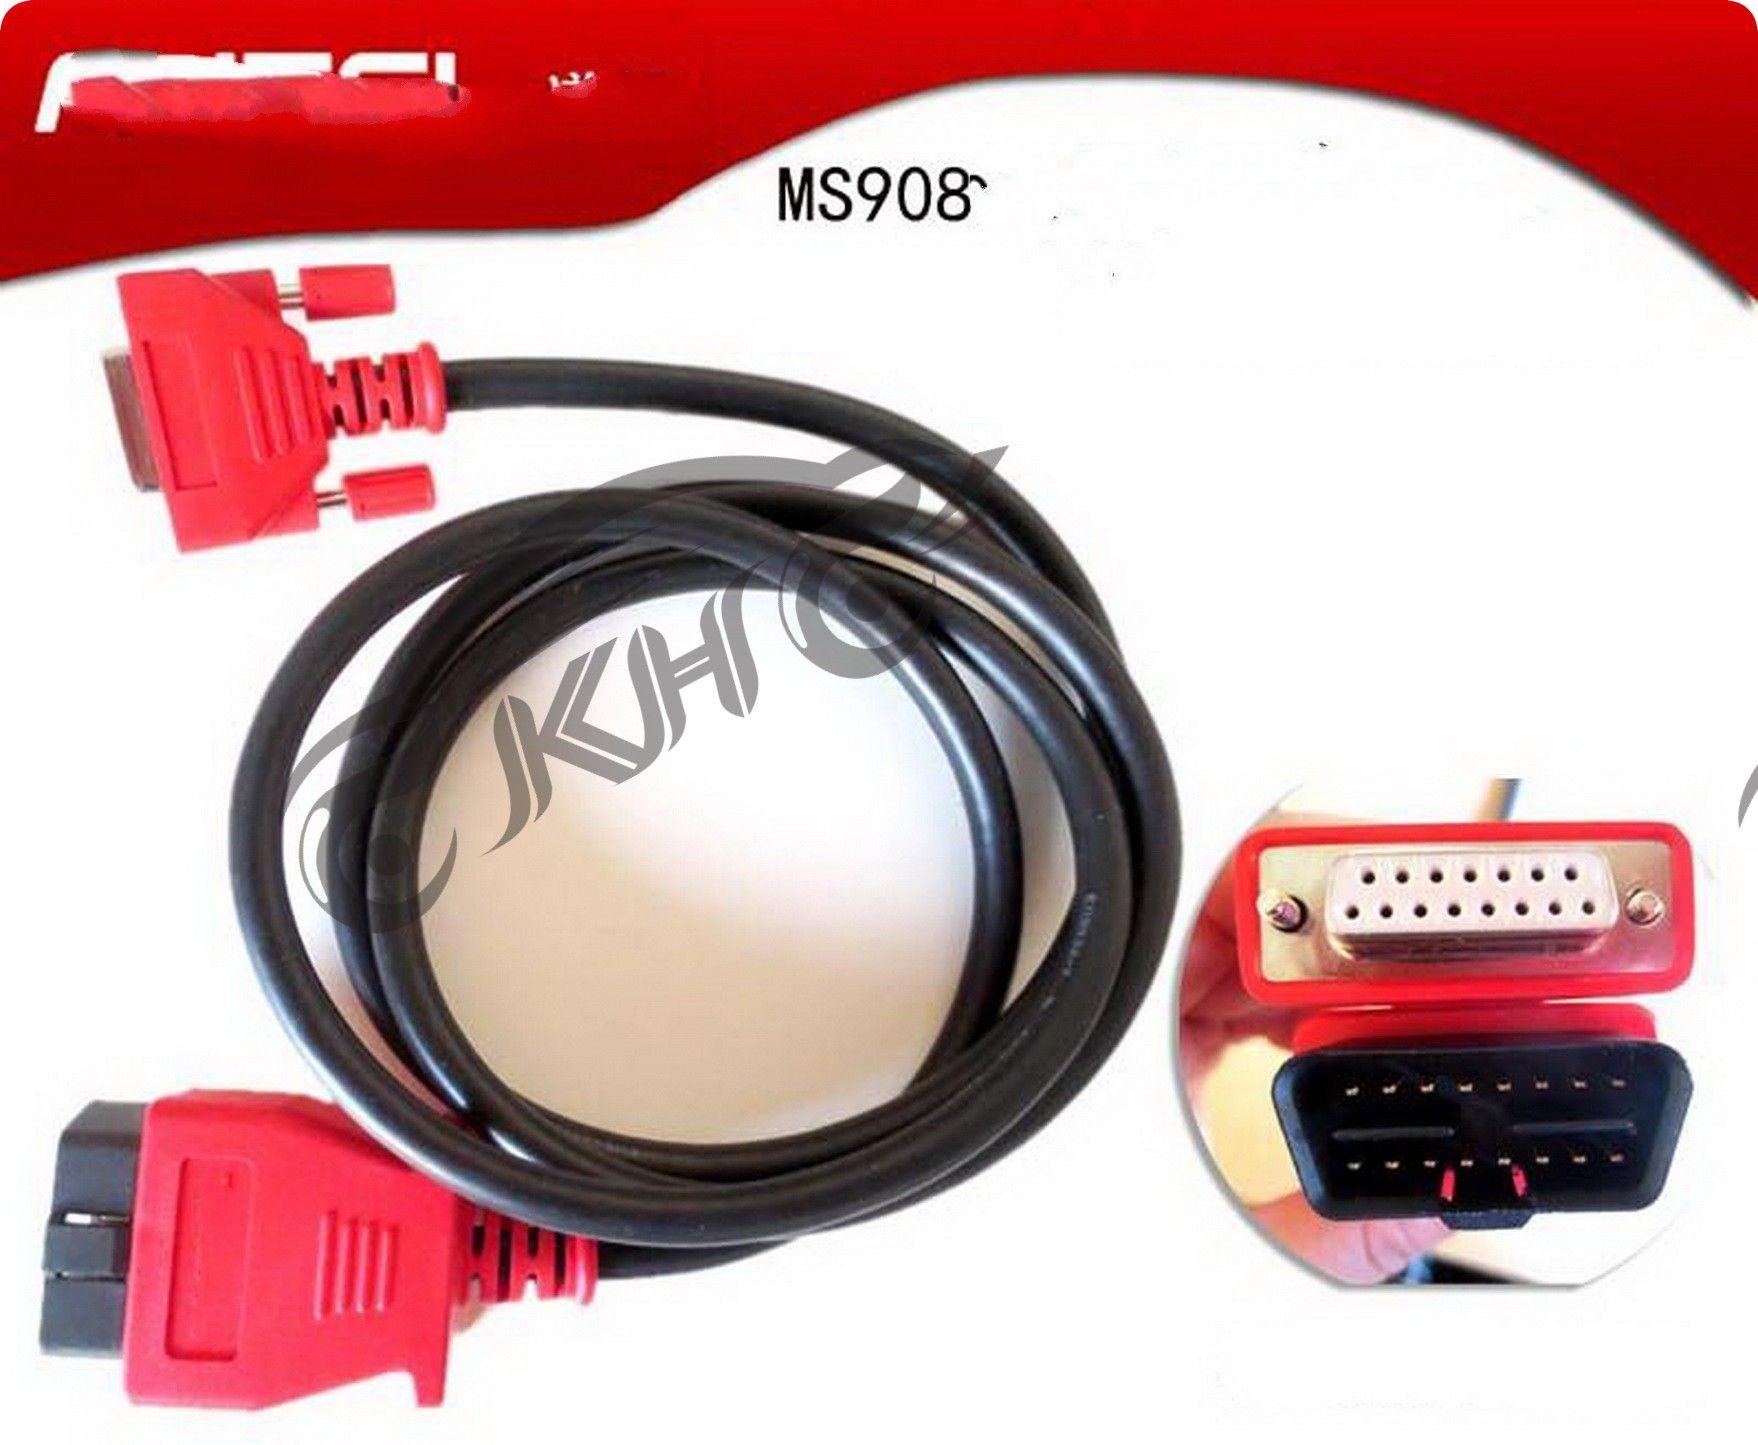 for Autel DLC Main Cable MaxiSys MS908S Pro Elite MS906 CV DS808 MS906CV  MS908S Mini IM608 IM508 MX MK 808 MK908P TS508 OBD EOBD